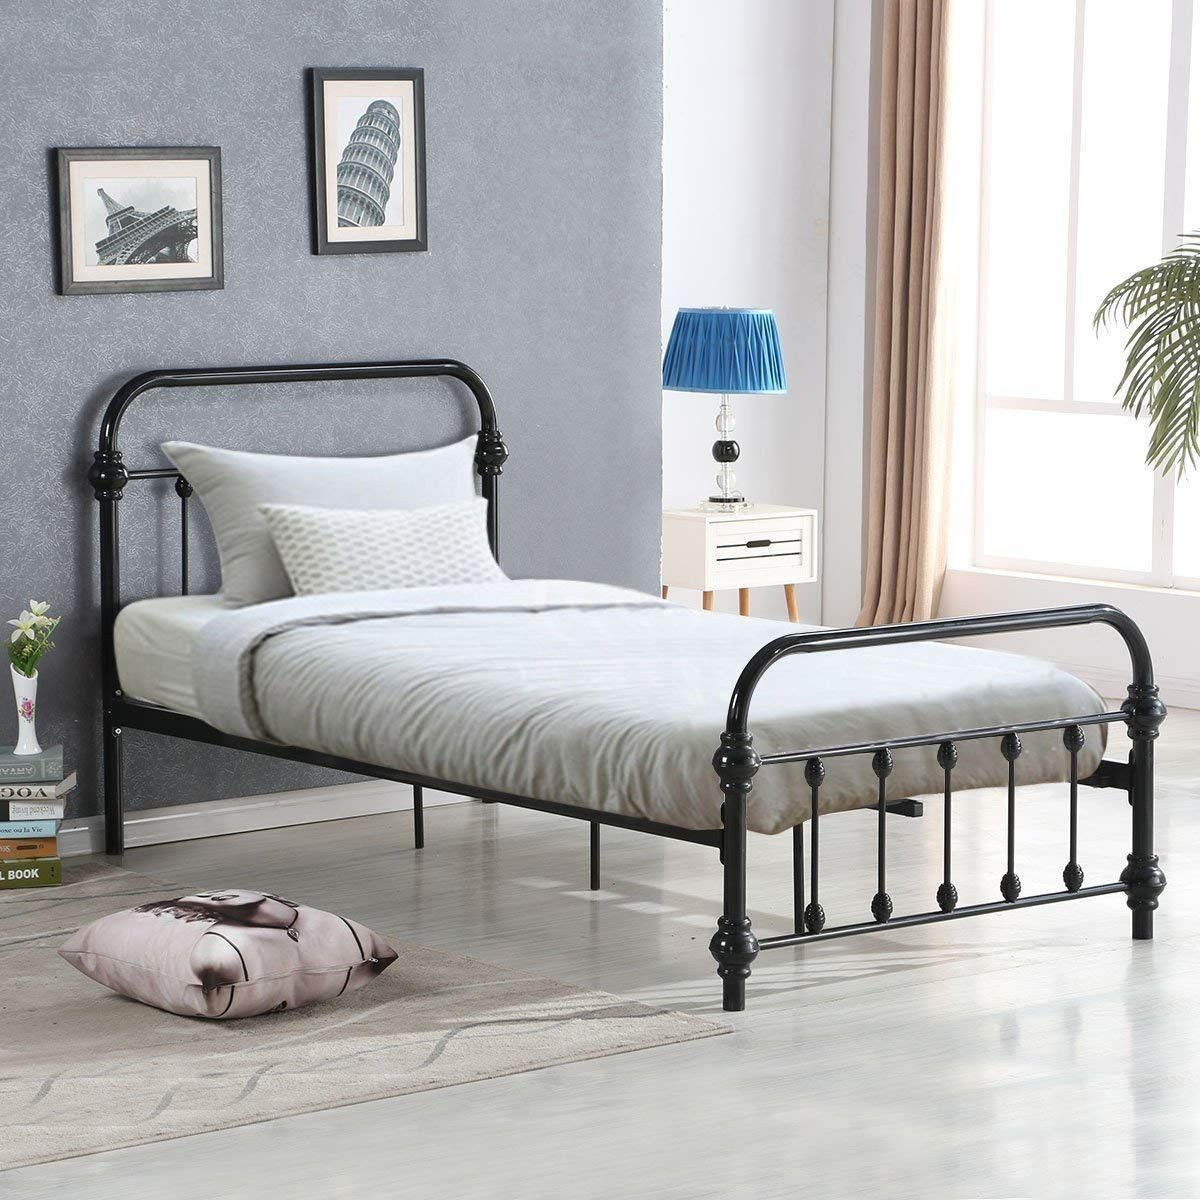 Giantex Twin Size Bed Frame Wood Slats Support Platform